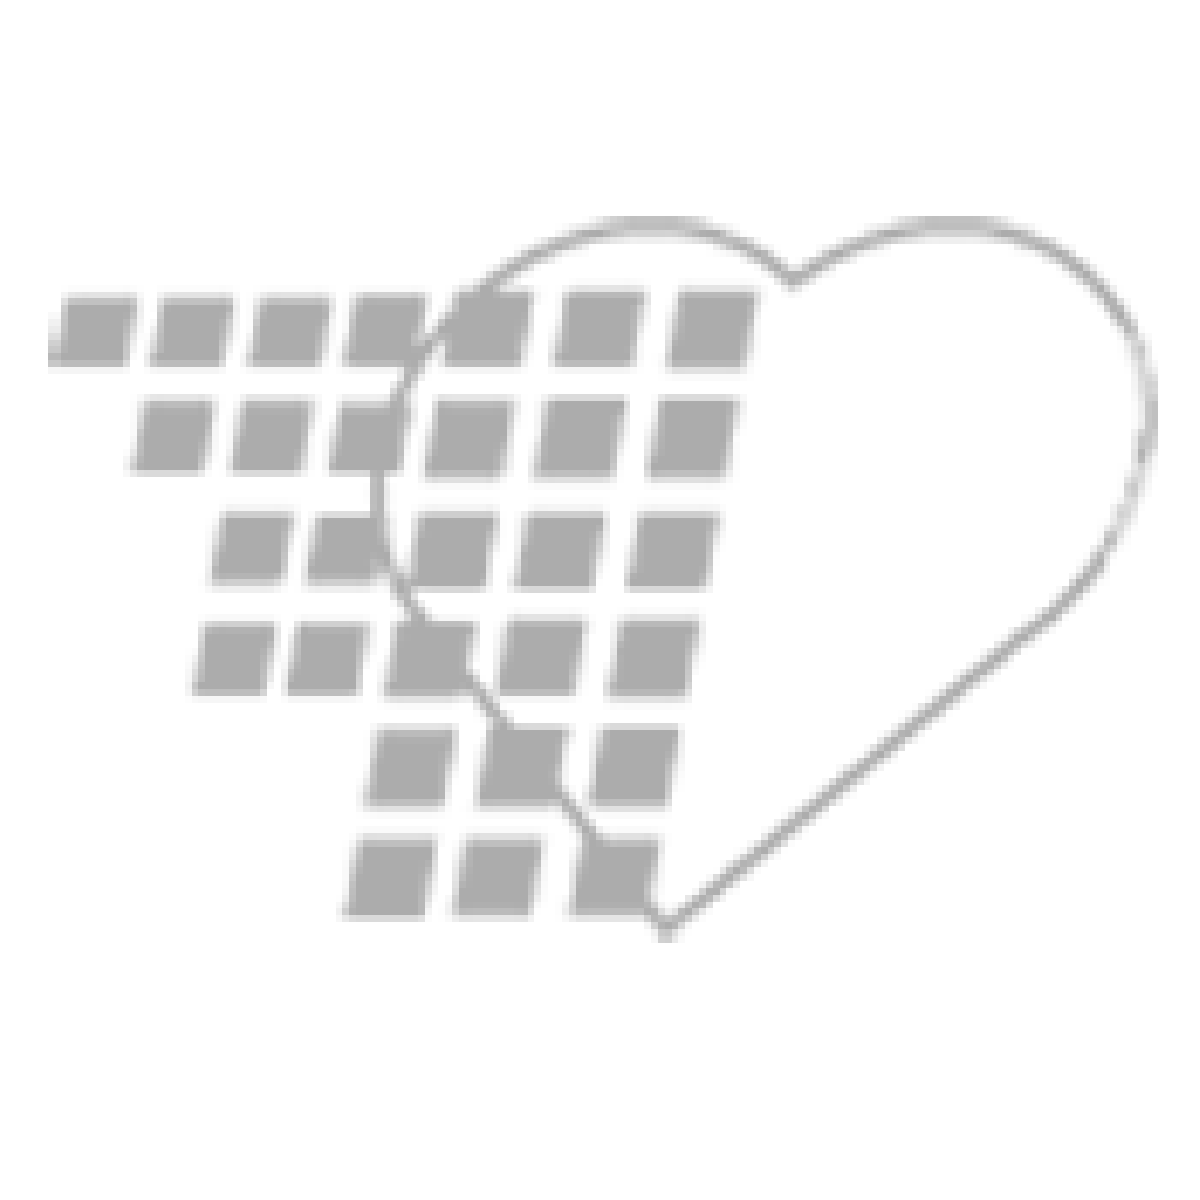 14-17-7251 Nasco Life/form® Simulated Individual Burn Roll - 3rd Degree